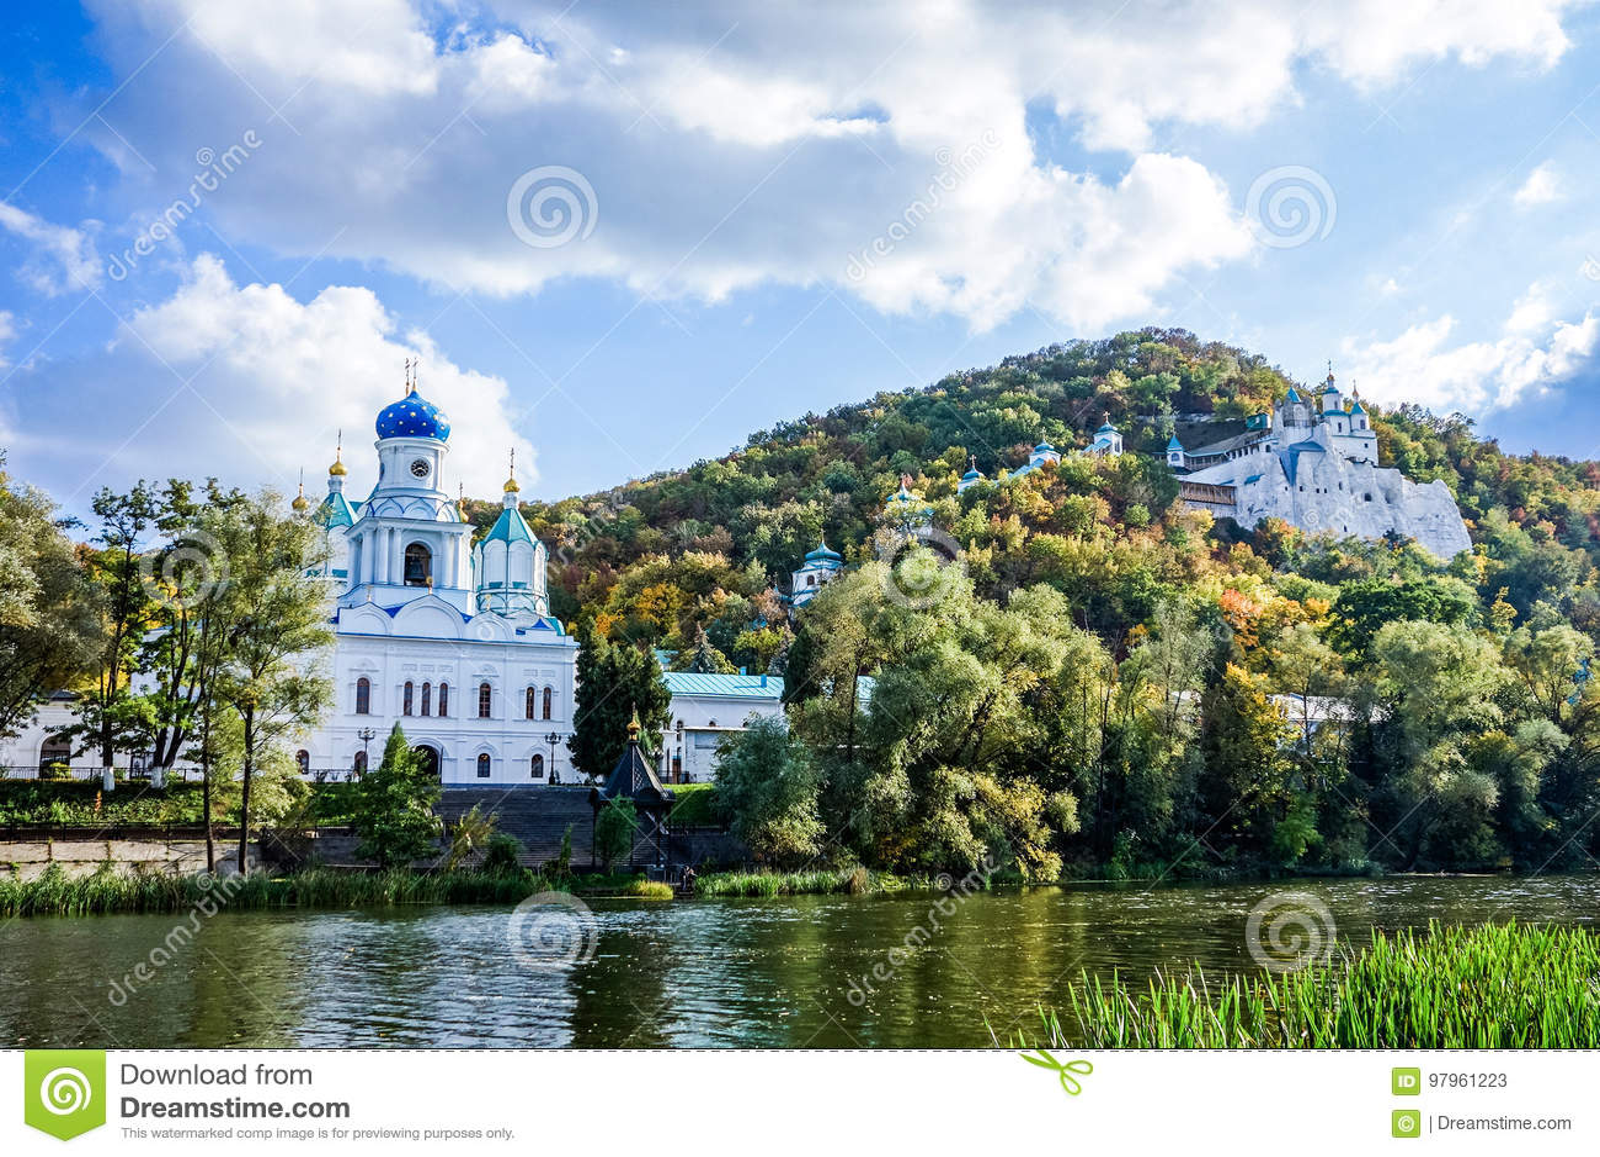 Svyatogorsk_landscape_1